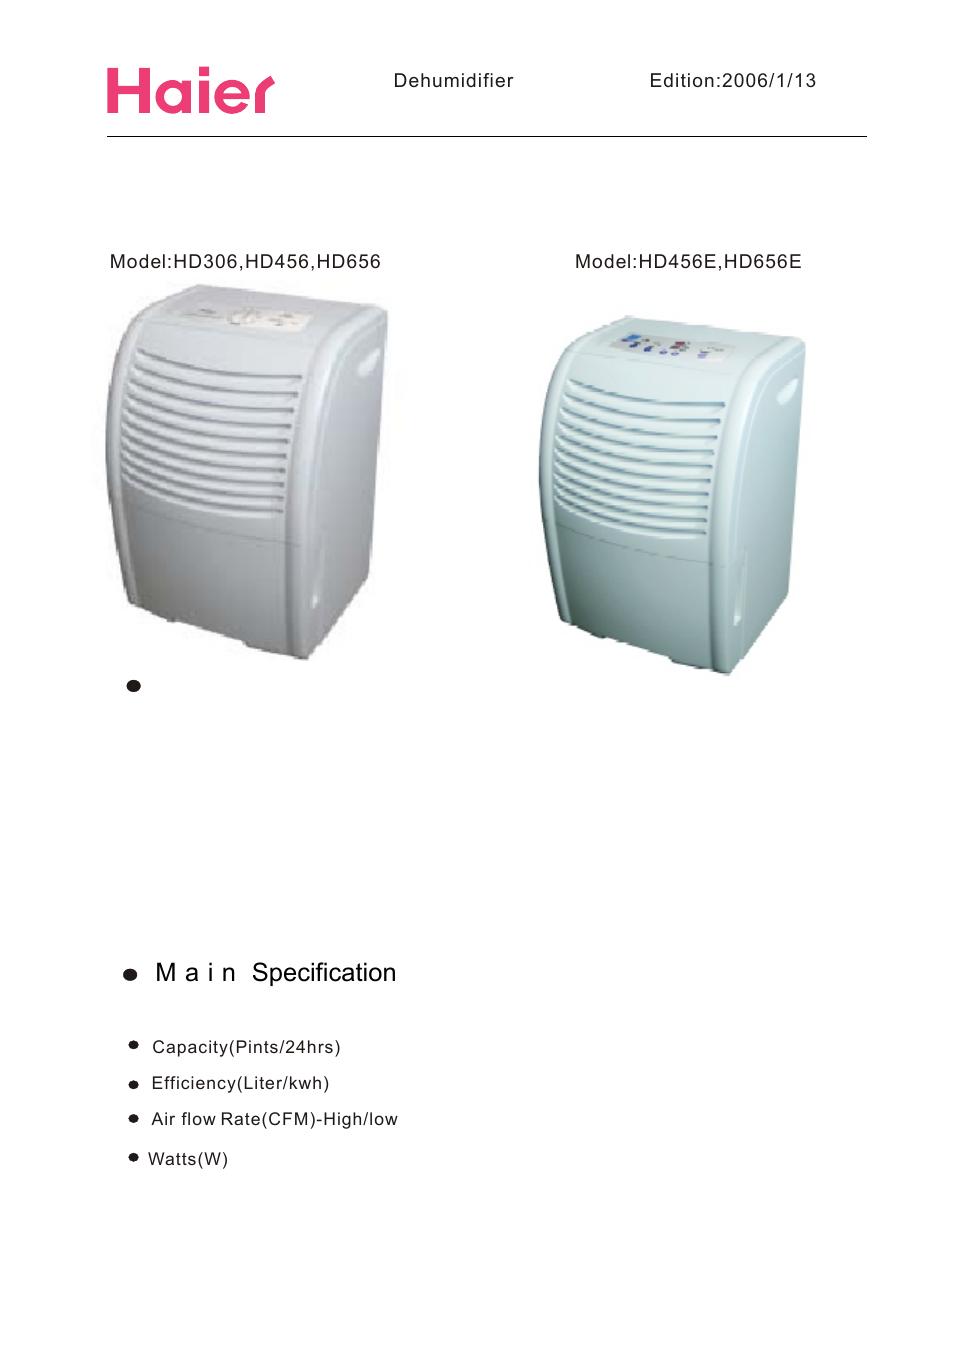 haier hd456 user manual page 2 18 original mode also for rh manualsdir com Model Manual Hyer Dehumidifier 45Ea-L Haier DE65EK 45 Pint Dehumidifier